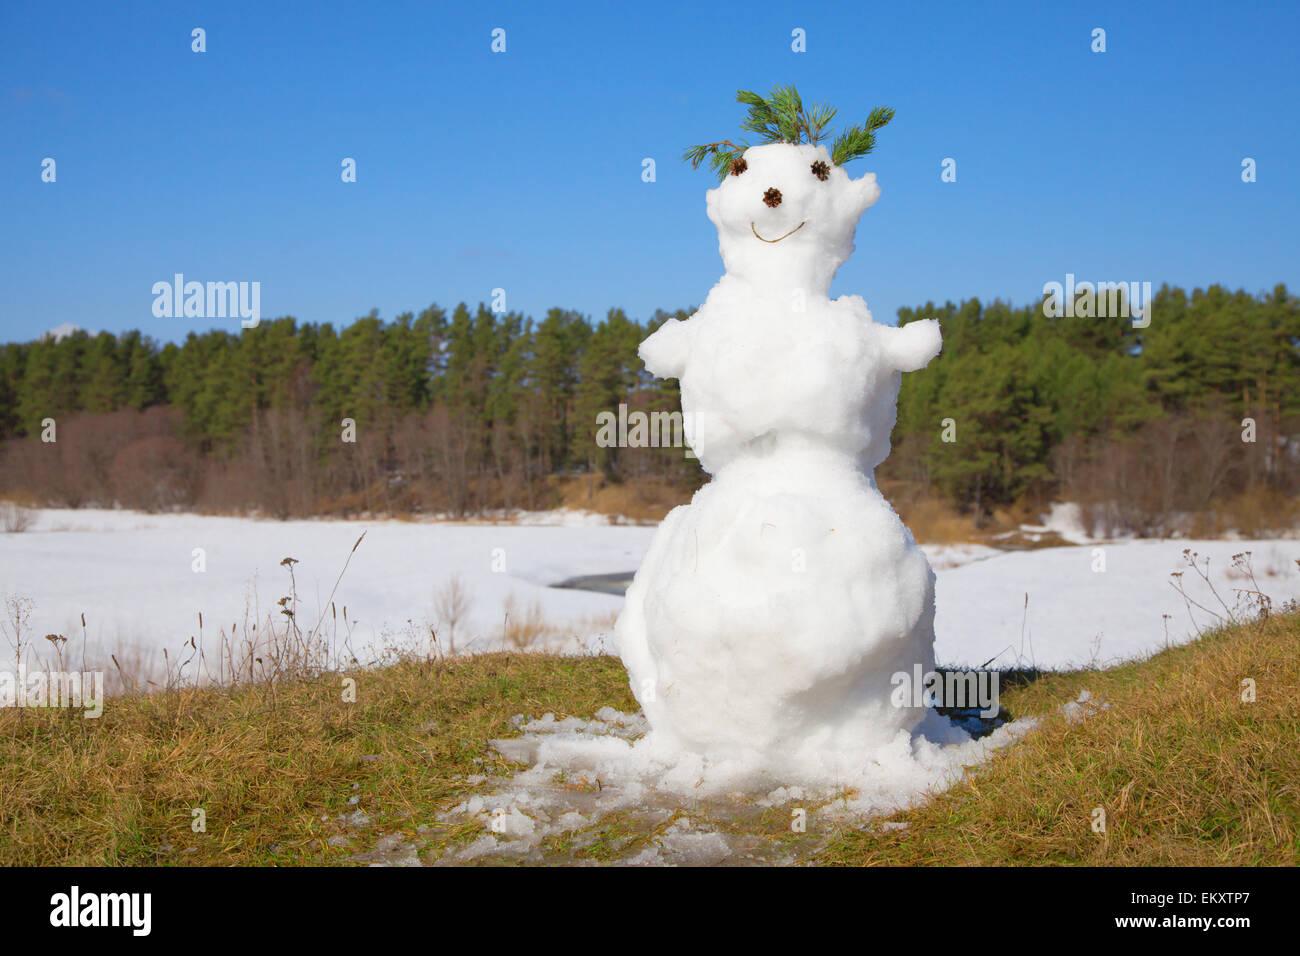 spring melt snowman - Stock Image